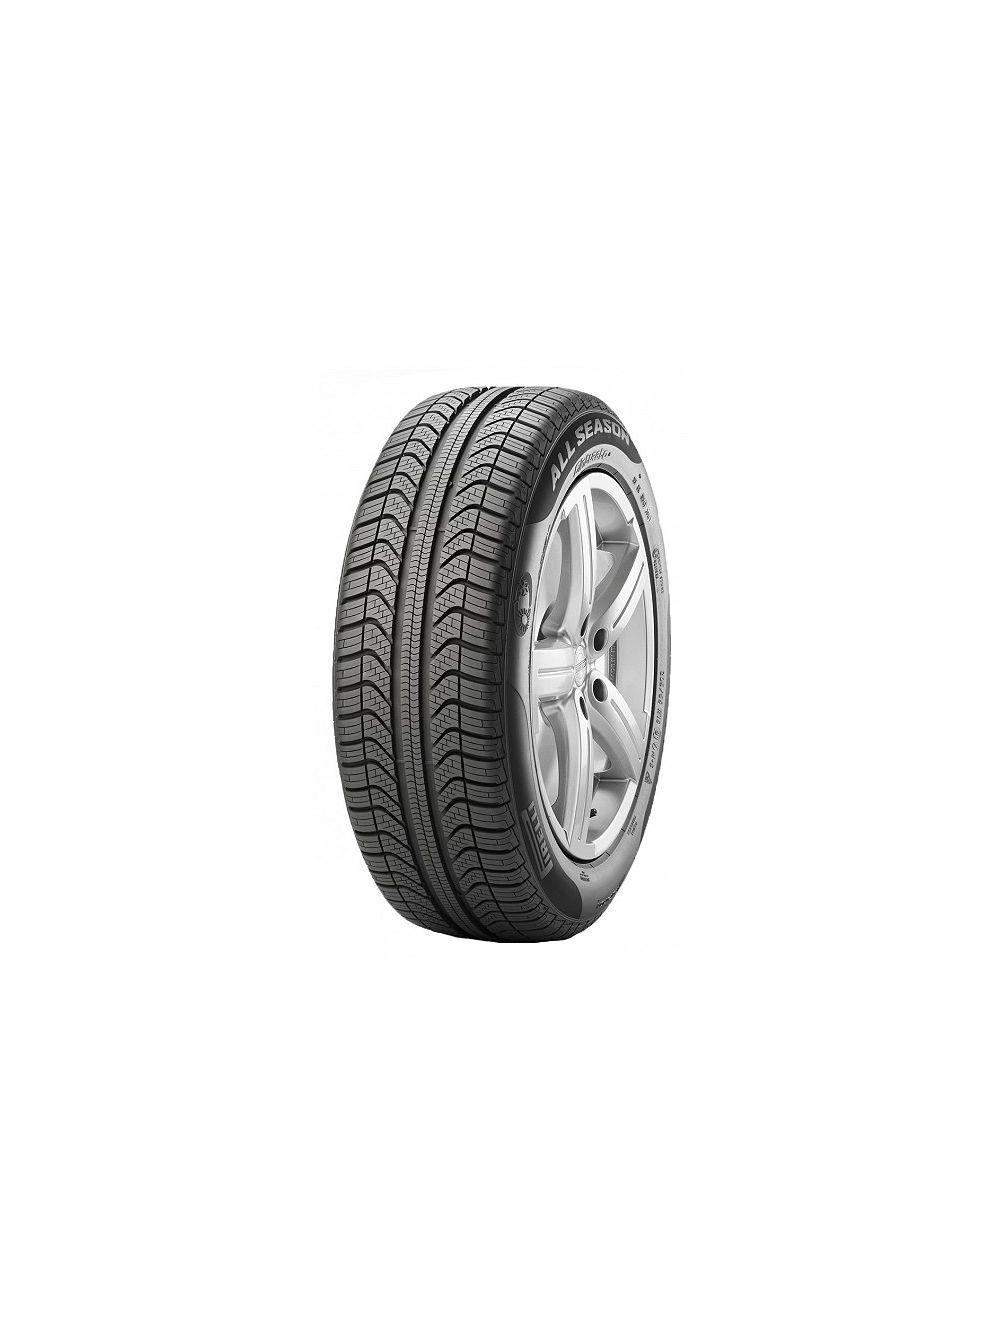 Pirelli 165/70R14 T Cinturato All Season Négyévszakos gumi